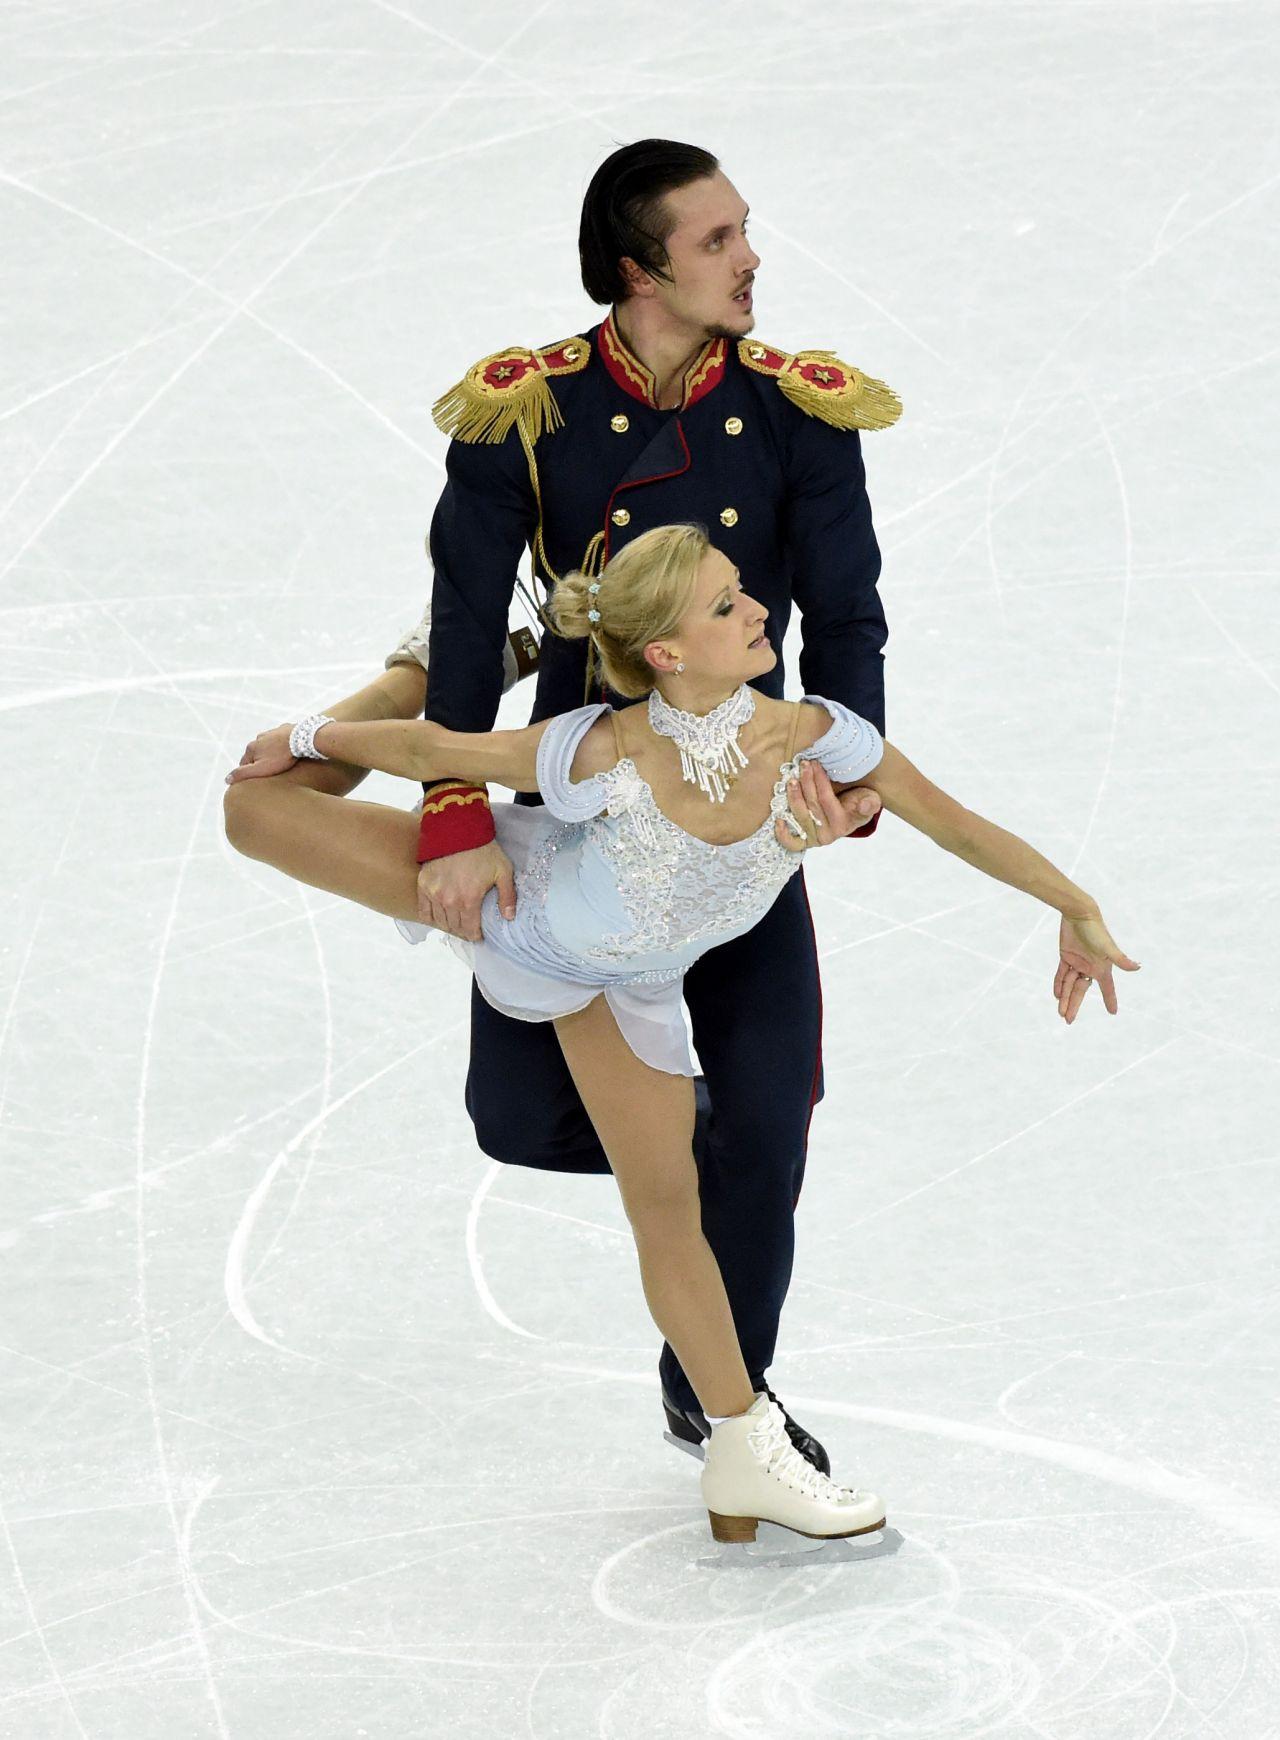 Tatiana Volosozhar - Sochi 2014 Winter Olympics